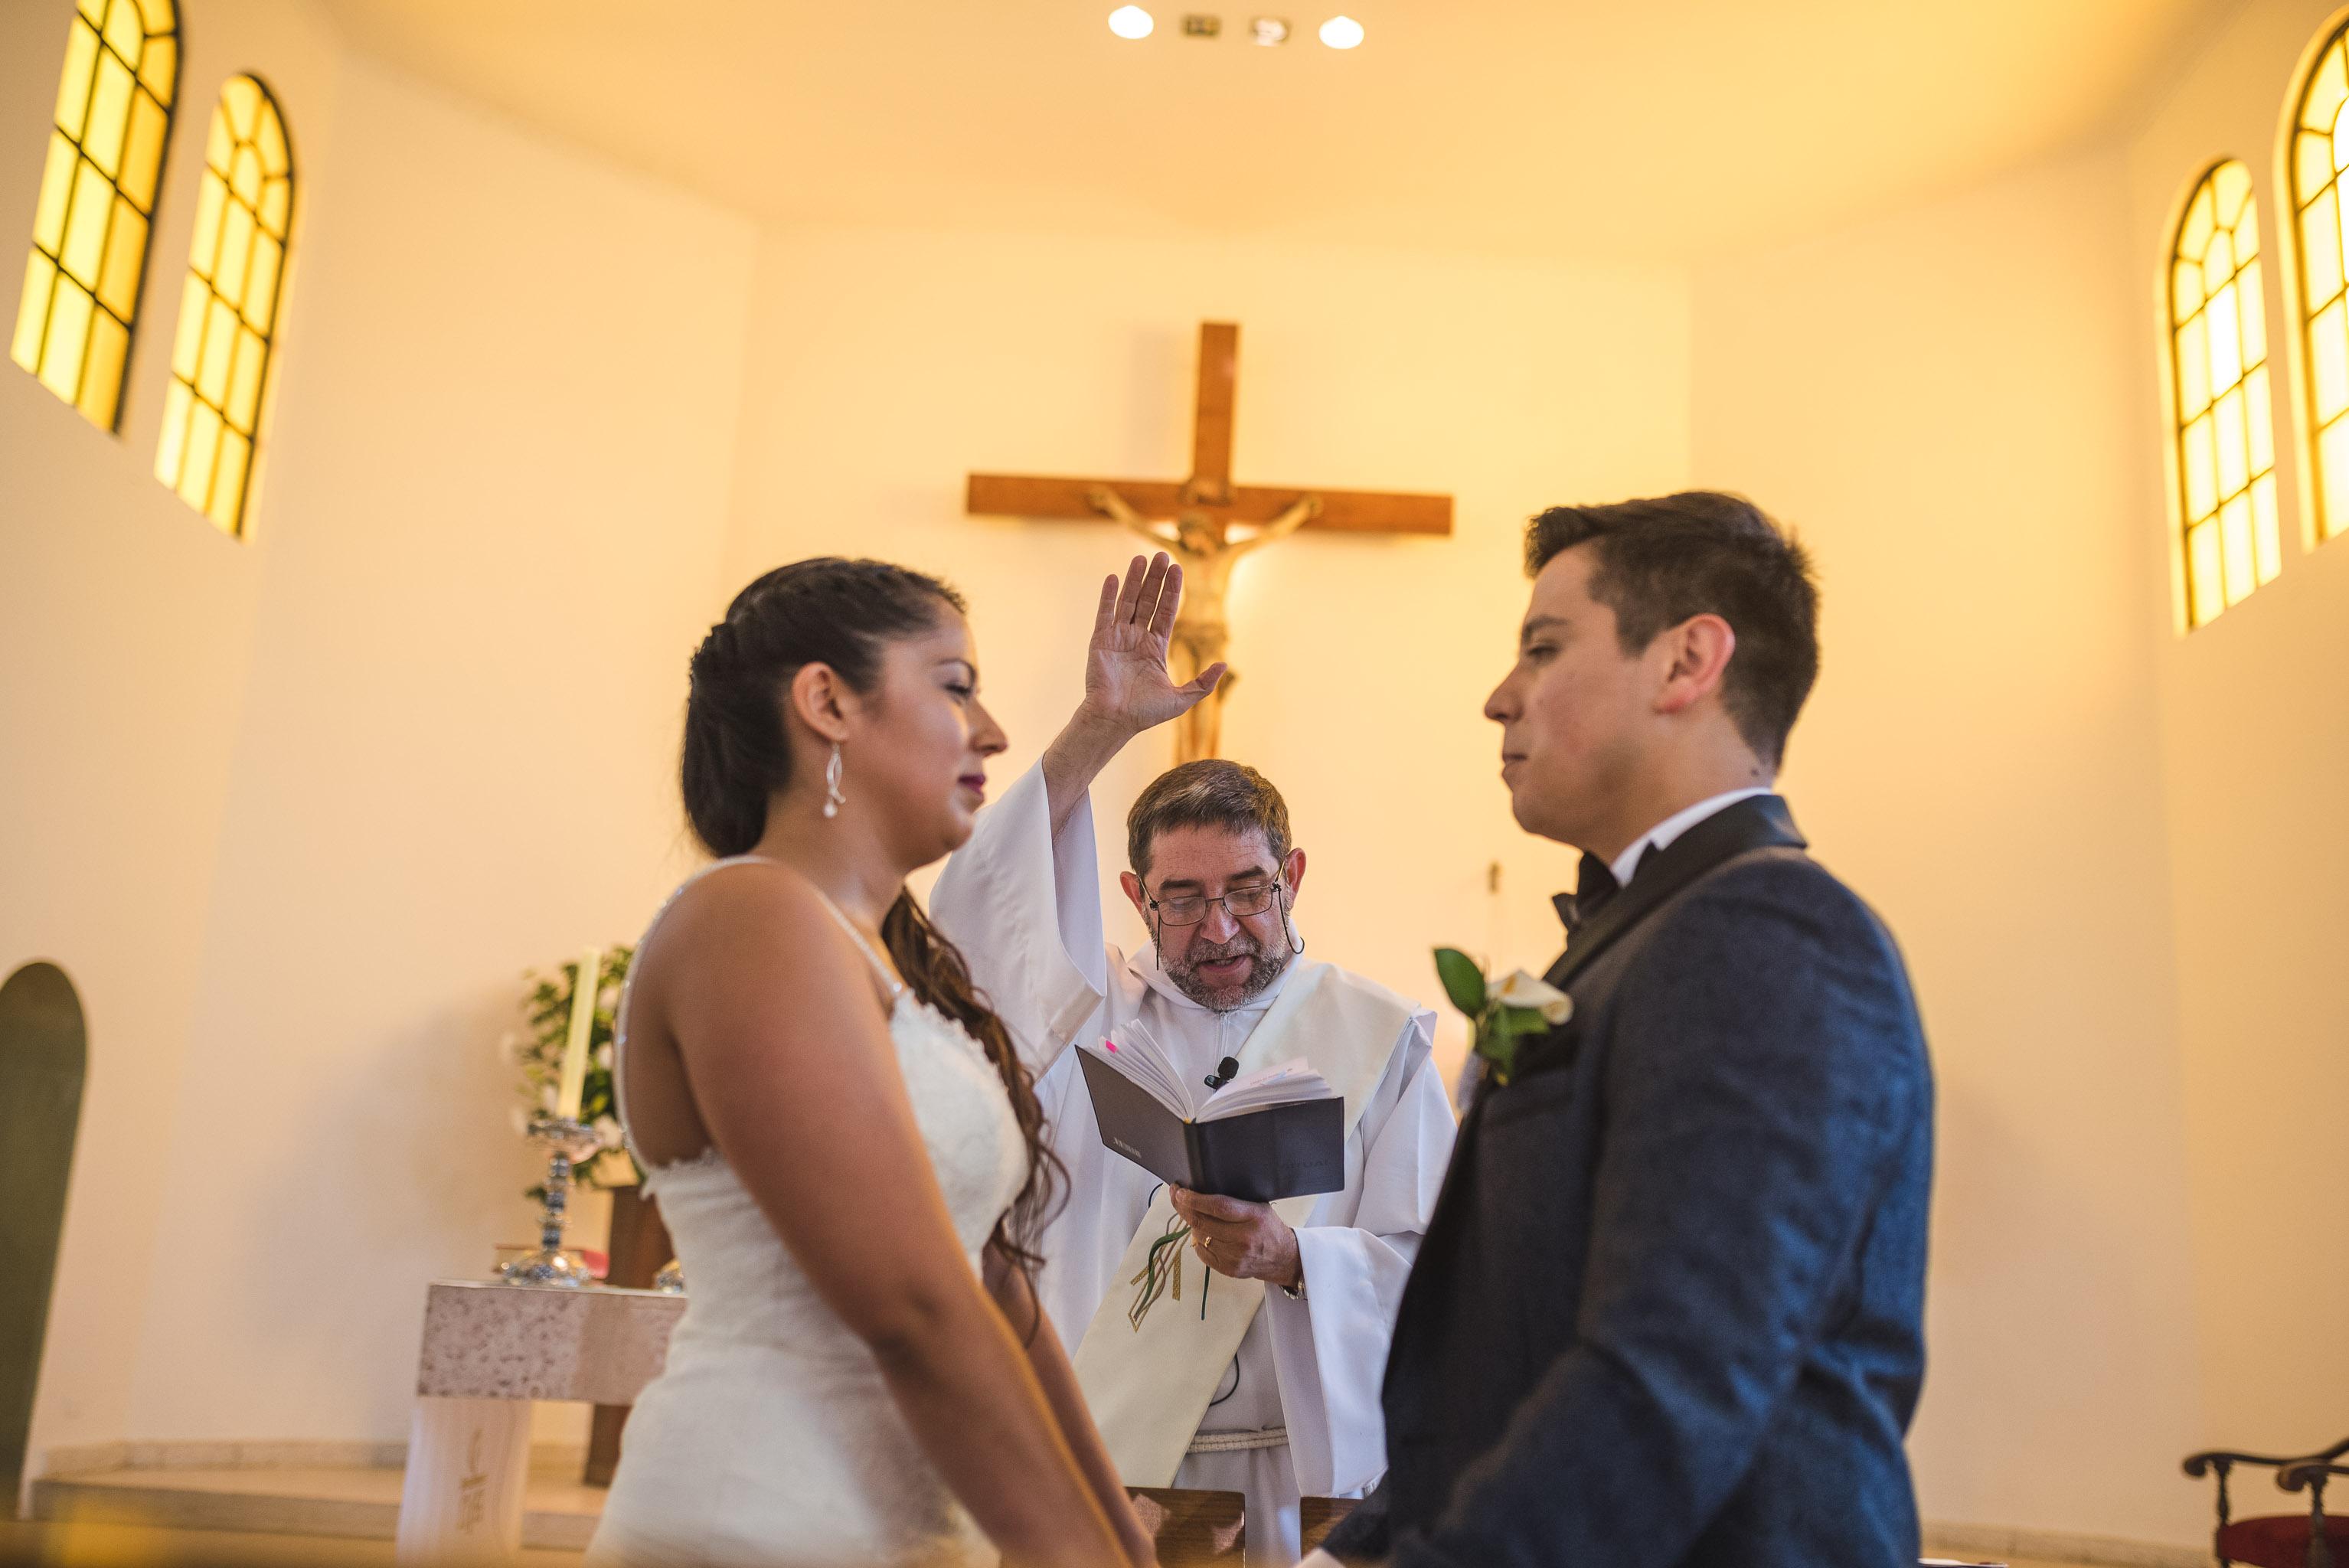 Matrimonio-centro de eventos-oliveto-santiago-fotógrafo de matrimonios-Iglesia de la Inmaculada Concepción-talagante